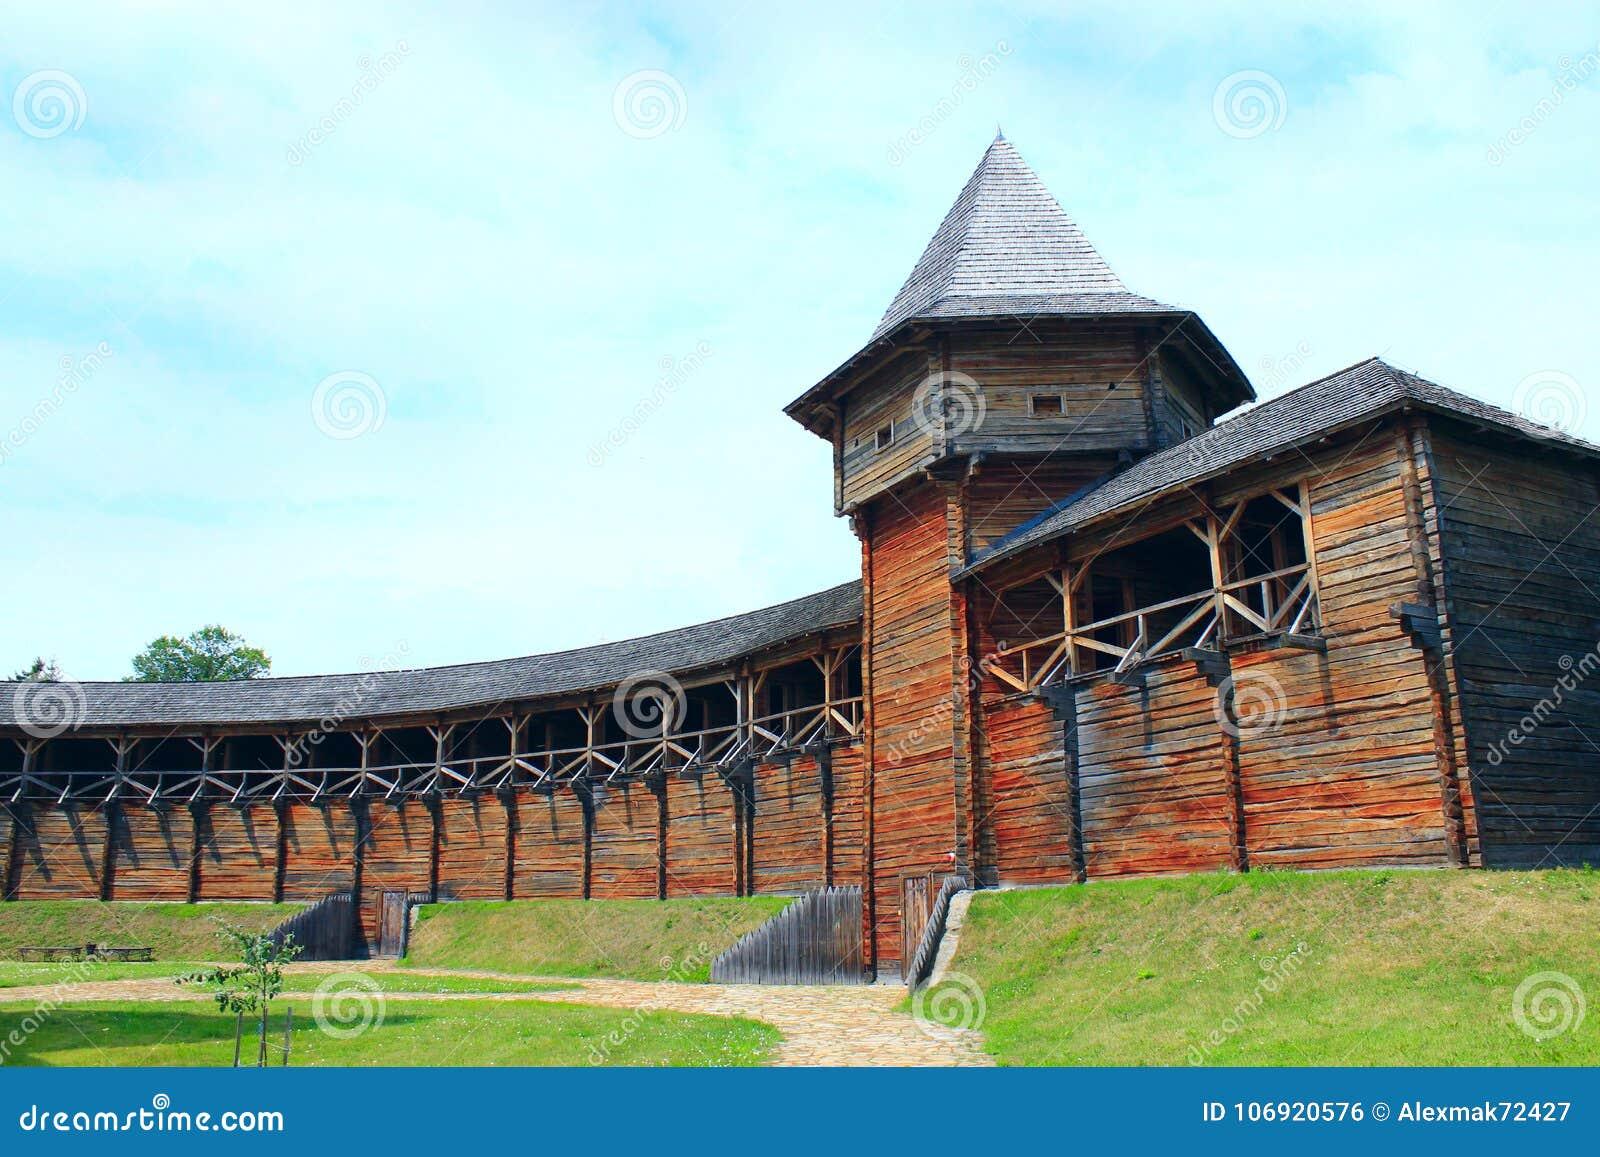 Baturyn Citadel. Ancient Slavonic architecture of fortress